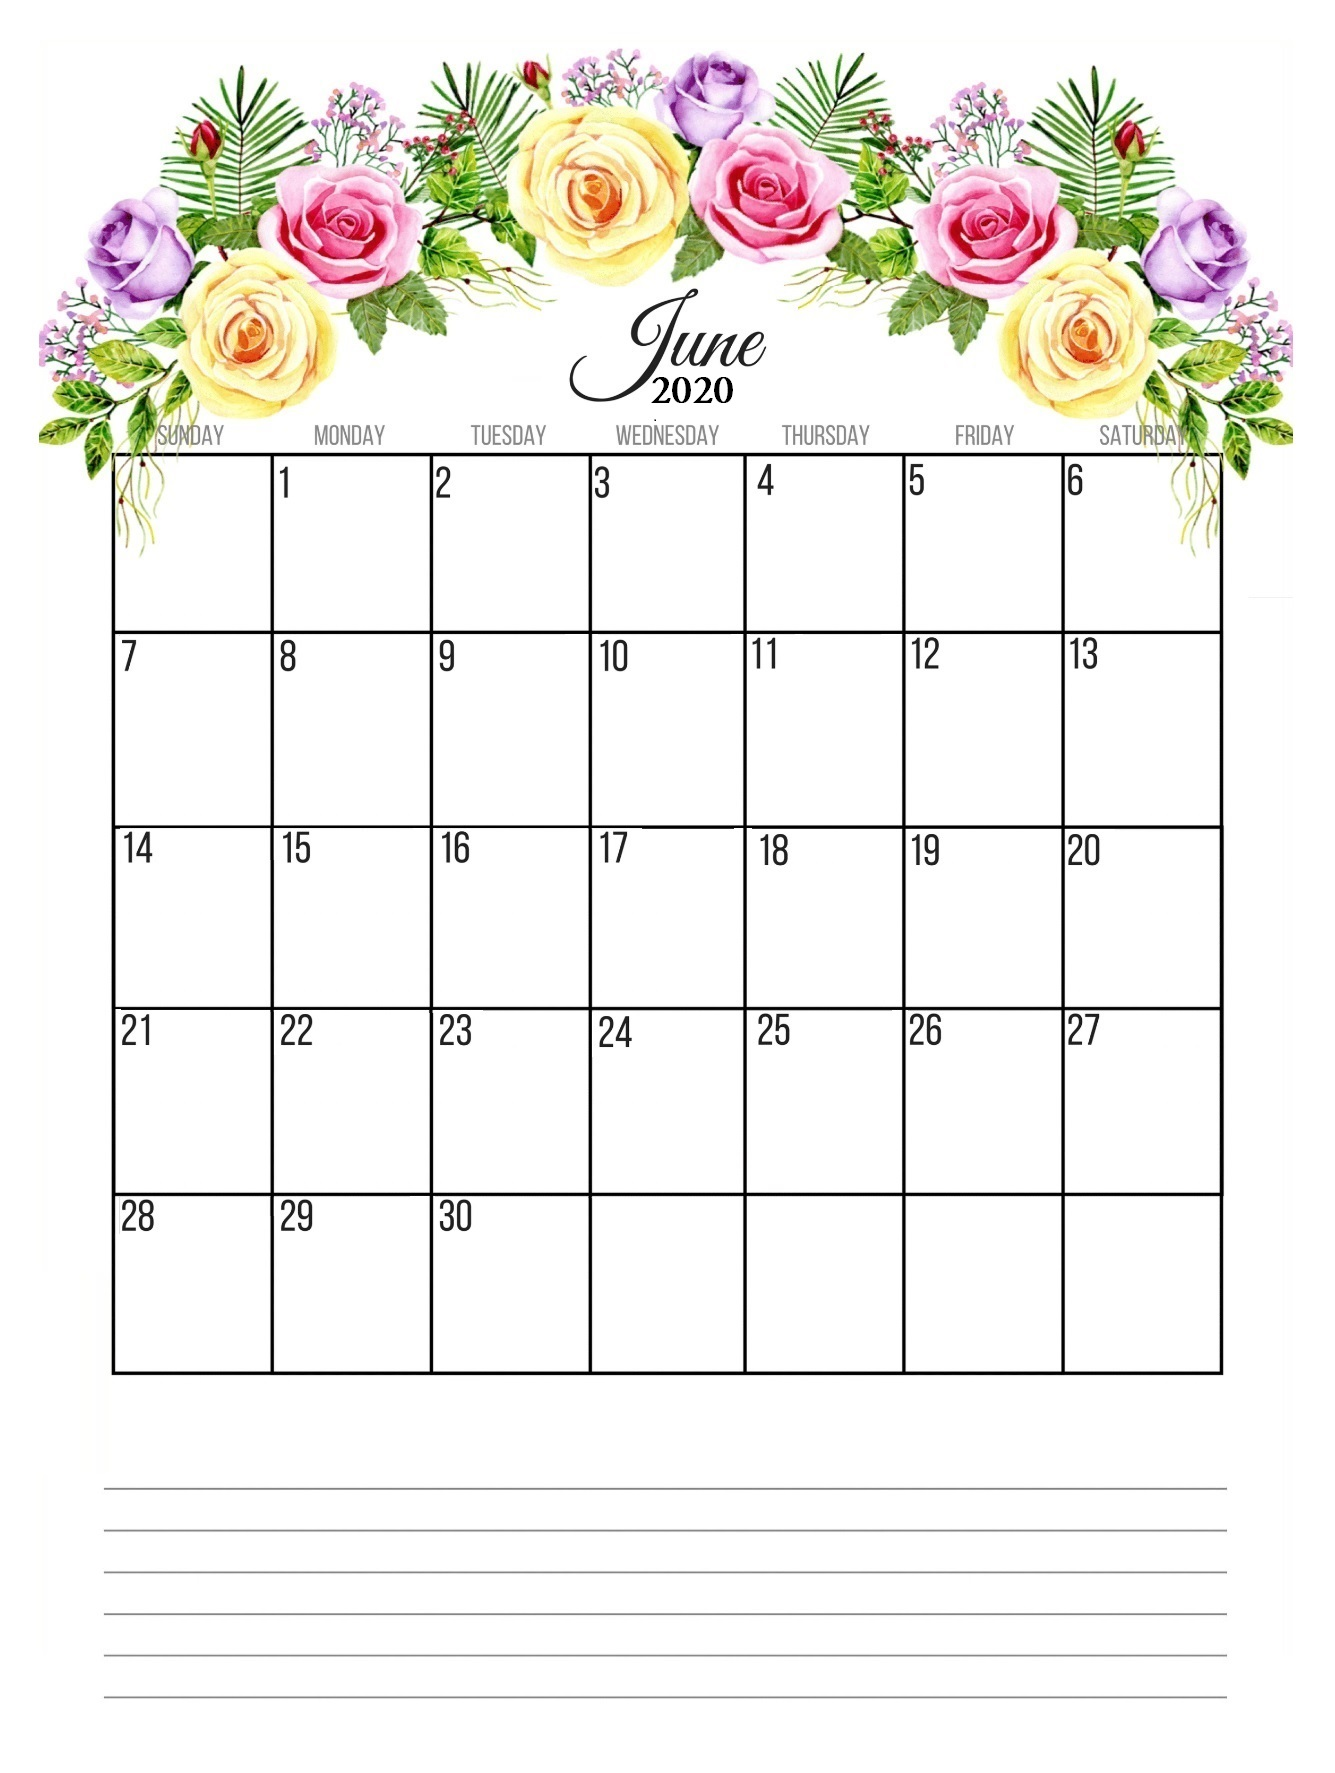 June 2020 Floral Calendar